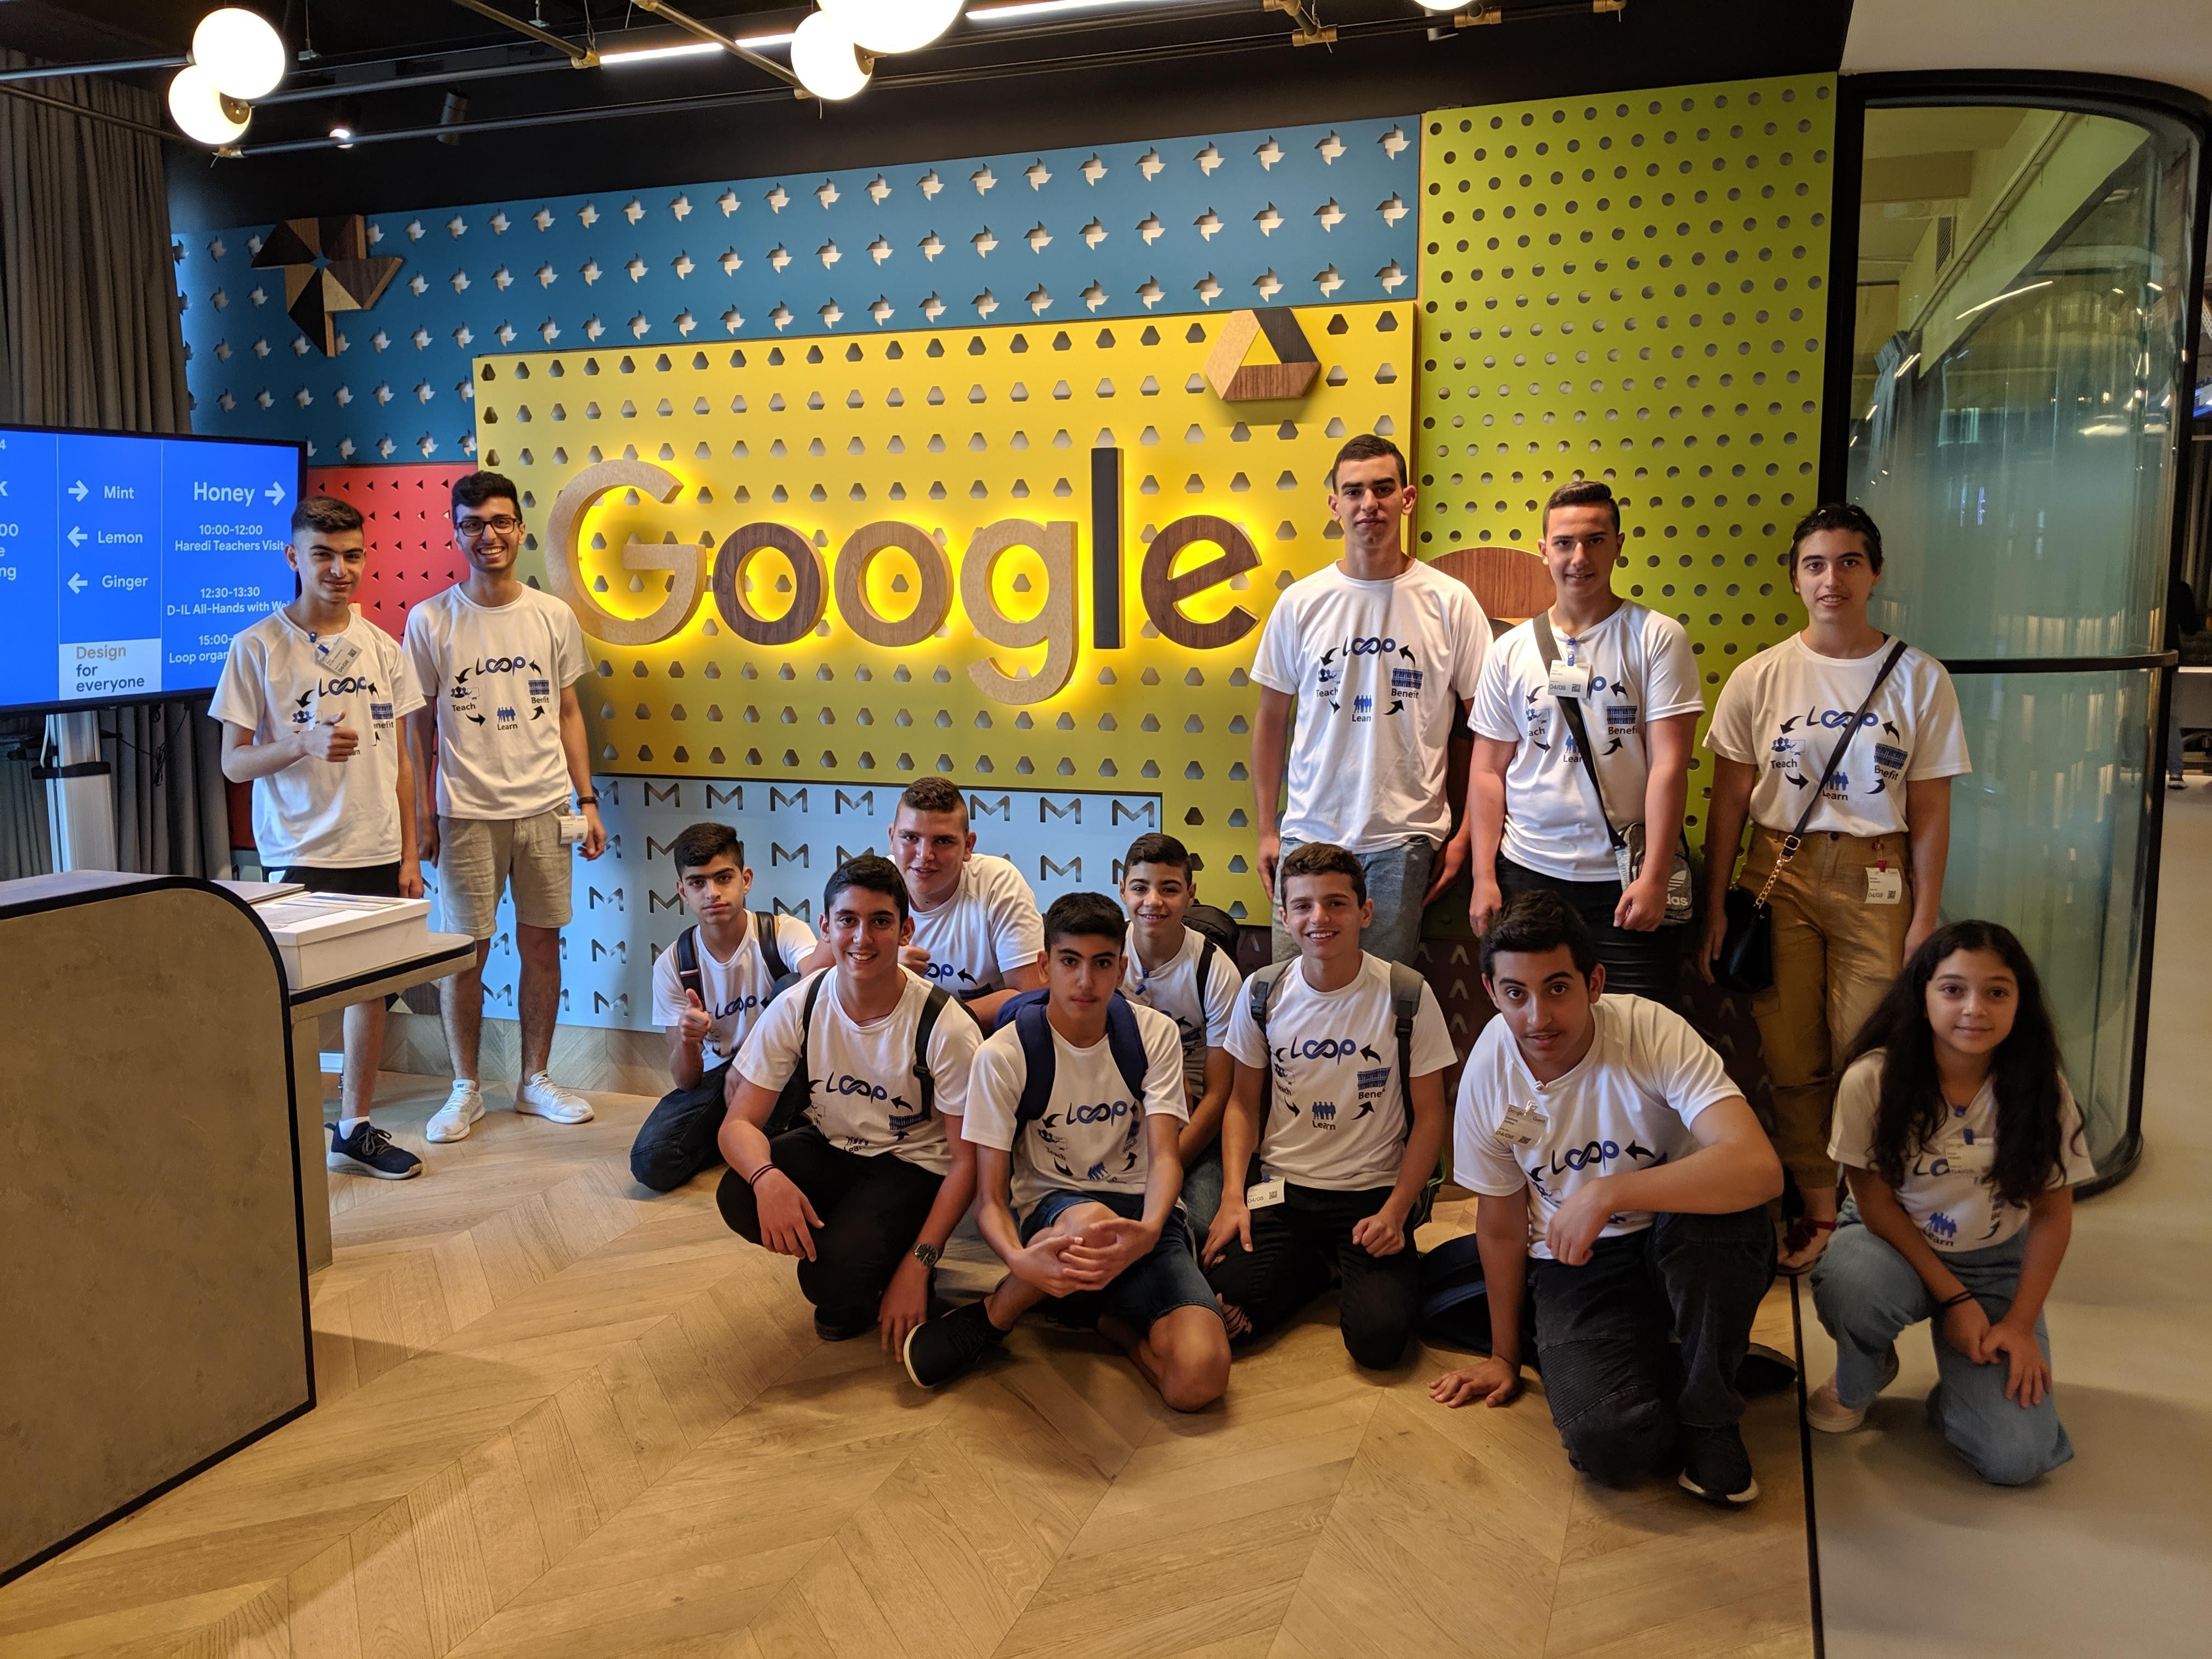 Google & Waze